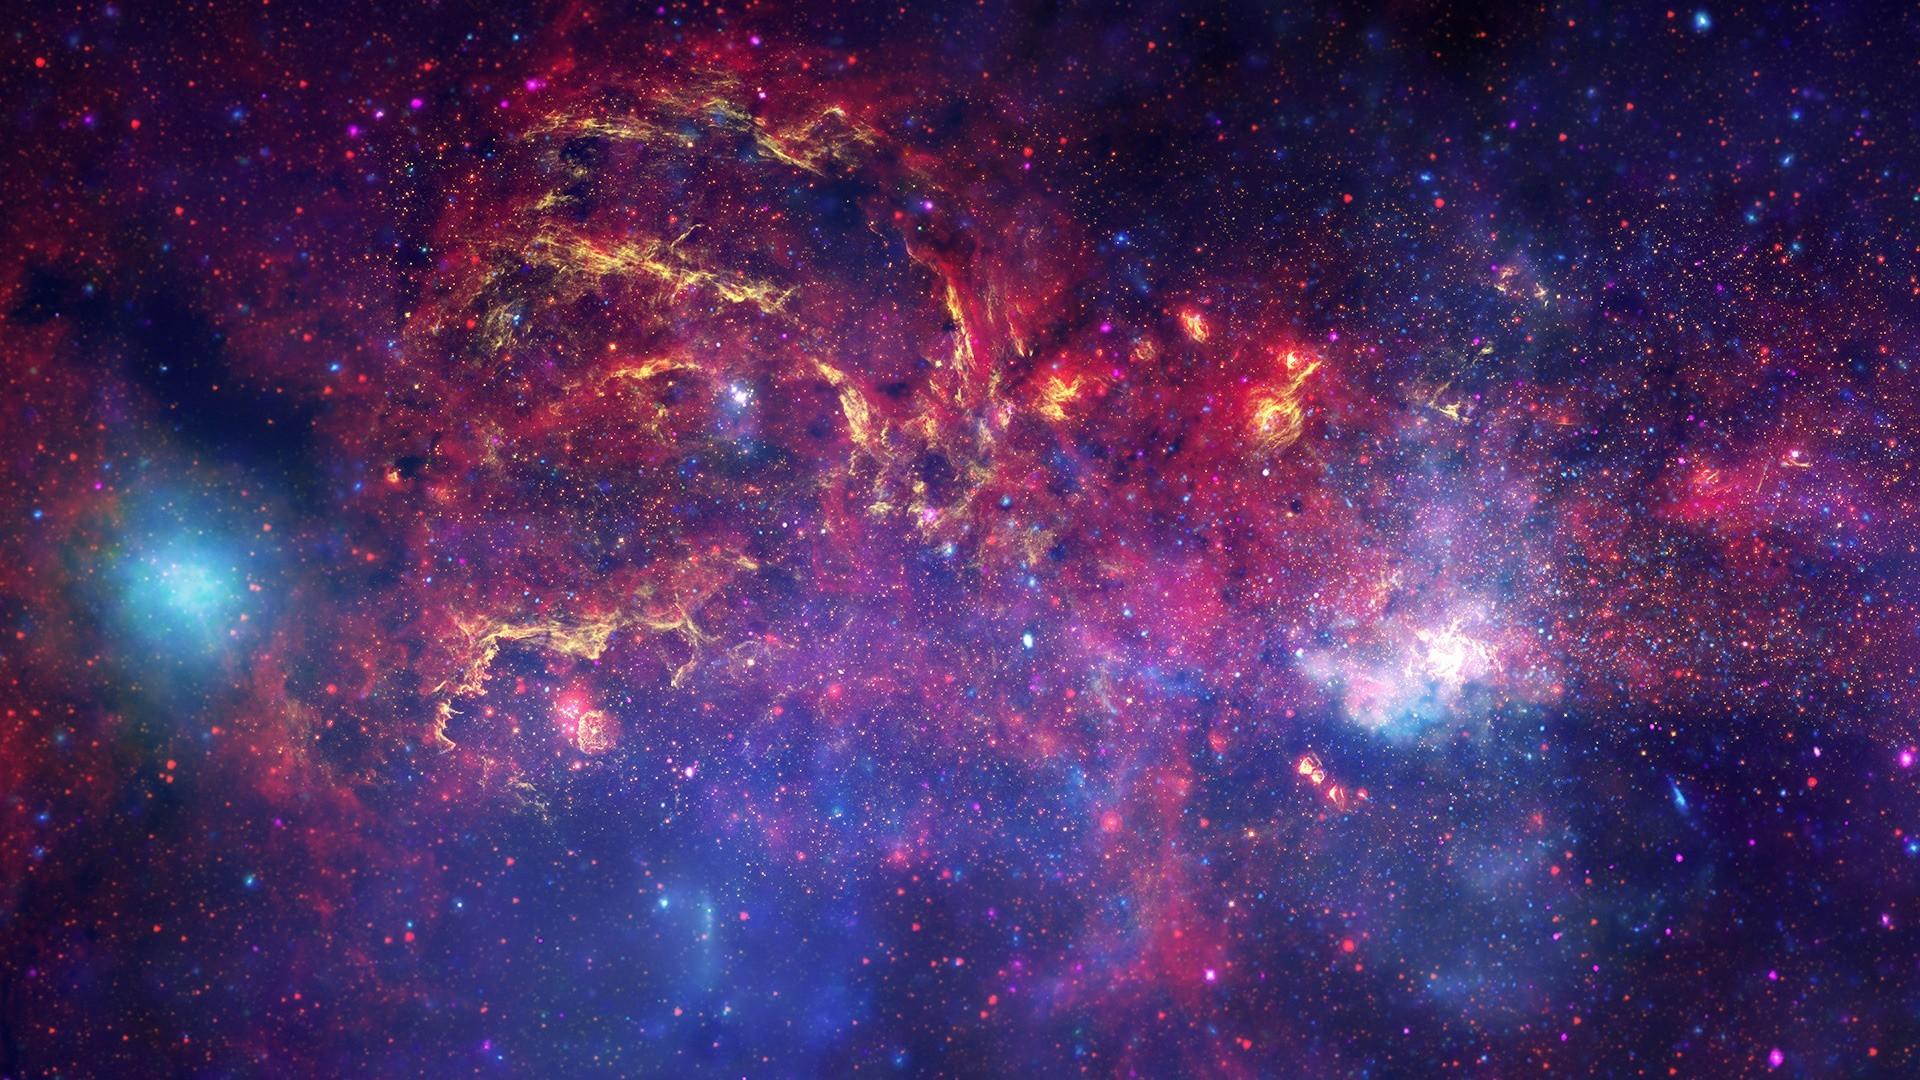 starry night sky star galaxy space dark iphone 6 wallpaper   sharovarka    Pinterest   Night sky stars, Starry night sky and Galaxy space